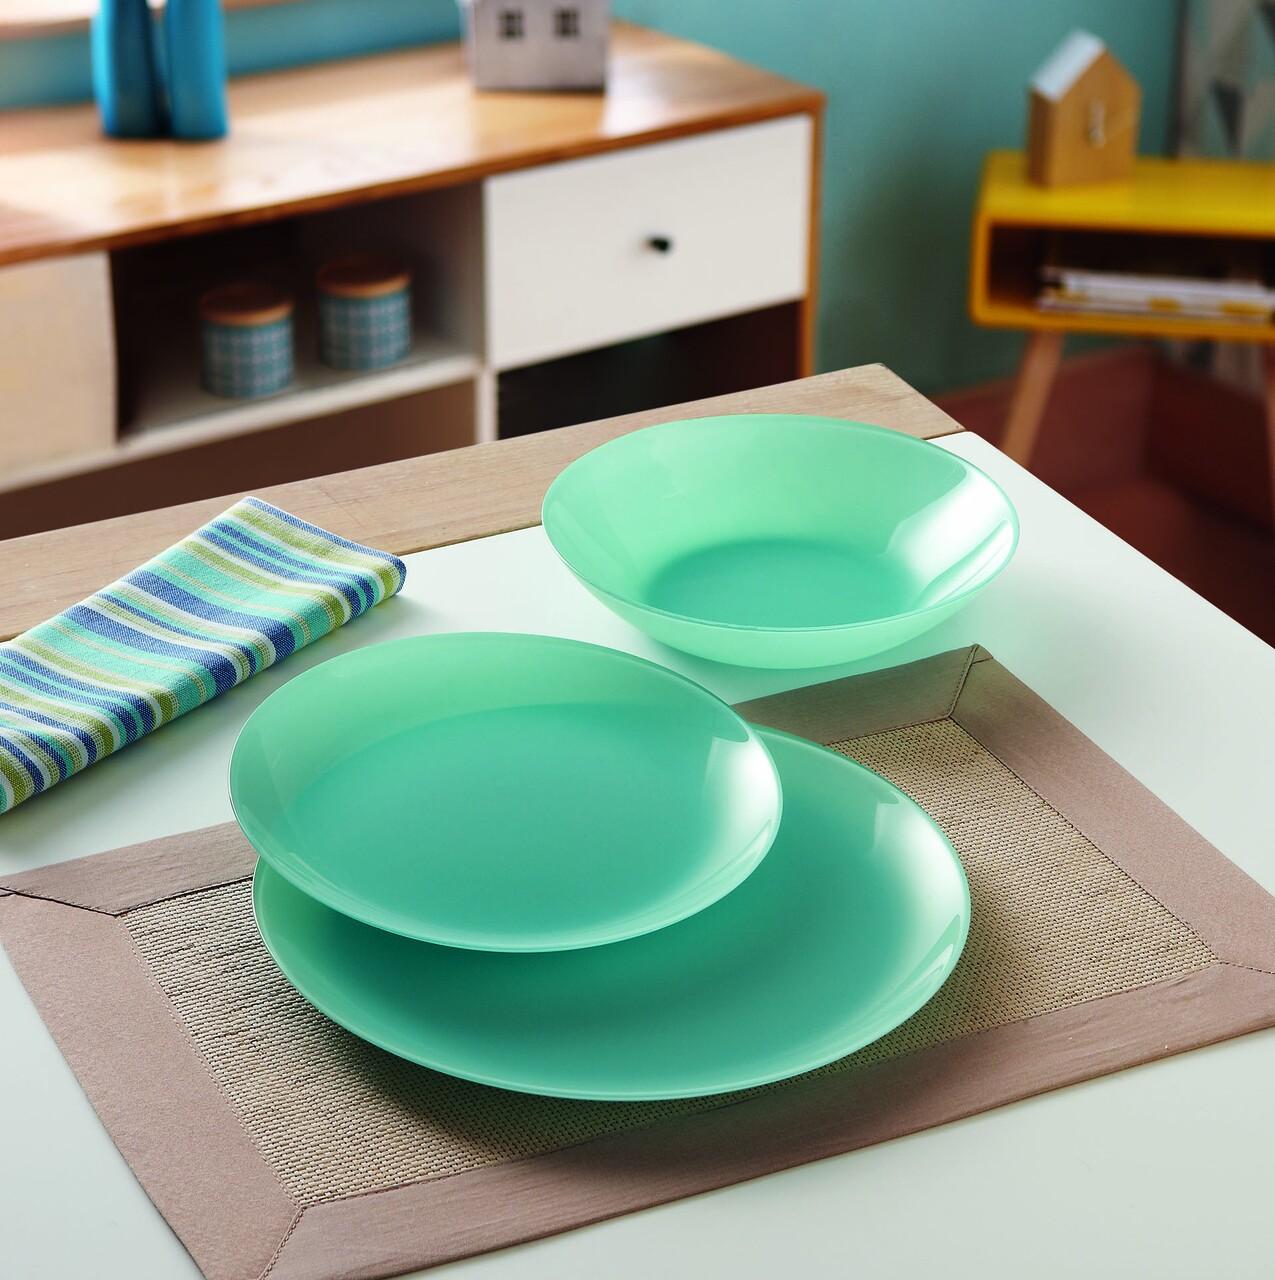 Serviciu de masa 18 piese Arty Soft Blue, Luminarc, opal, bleu